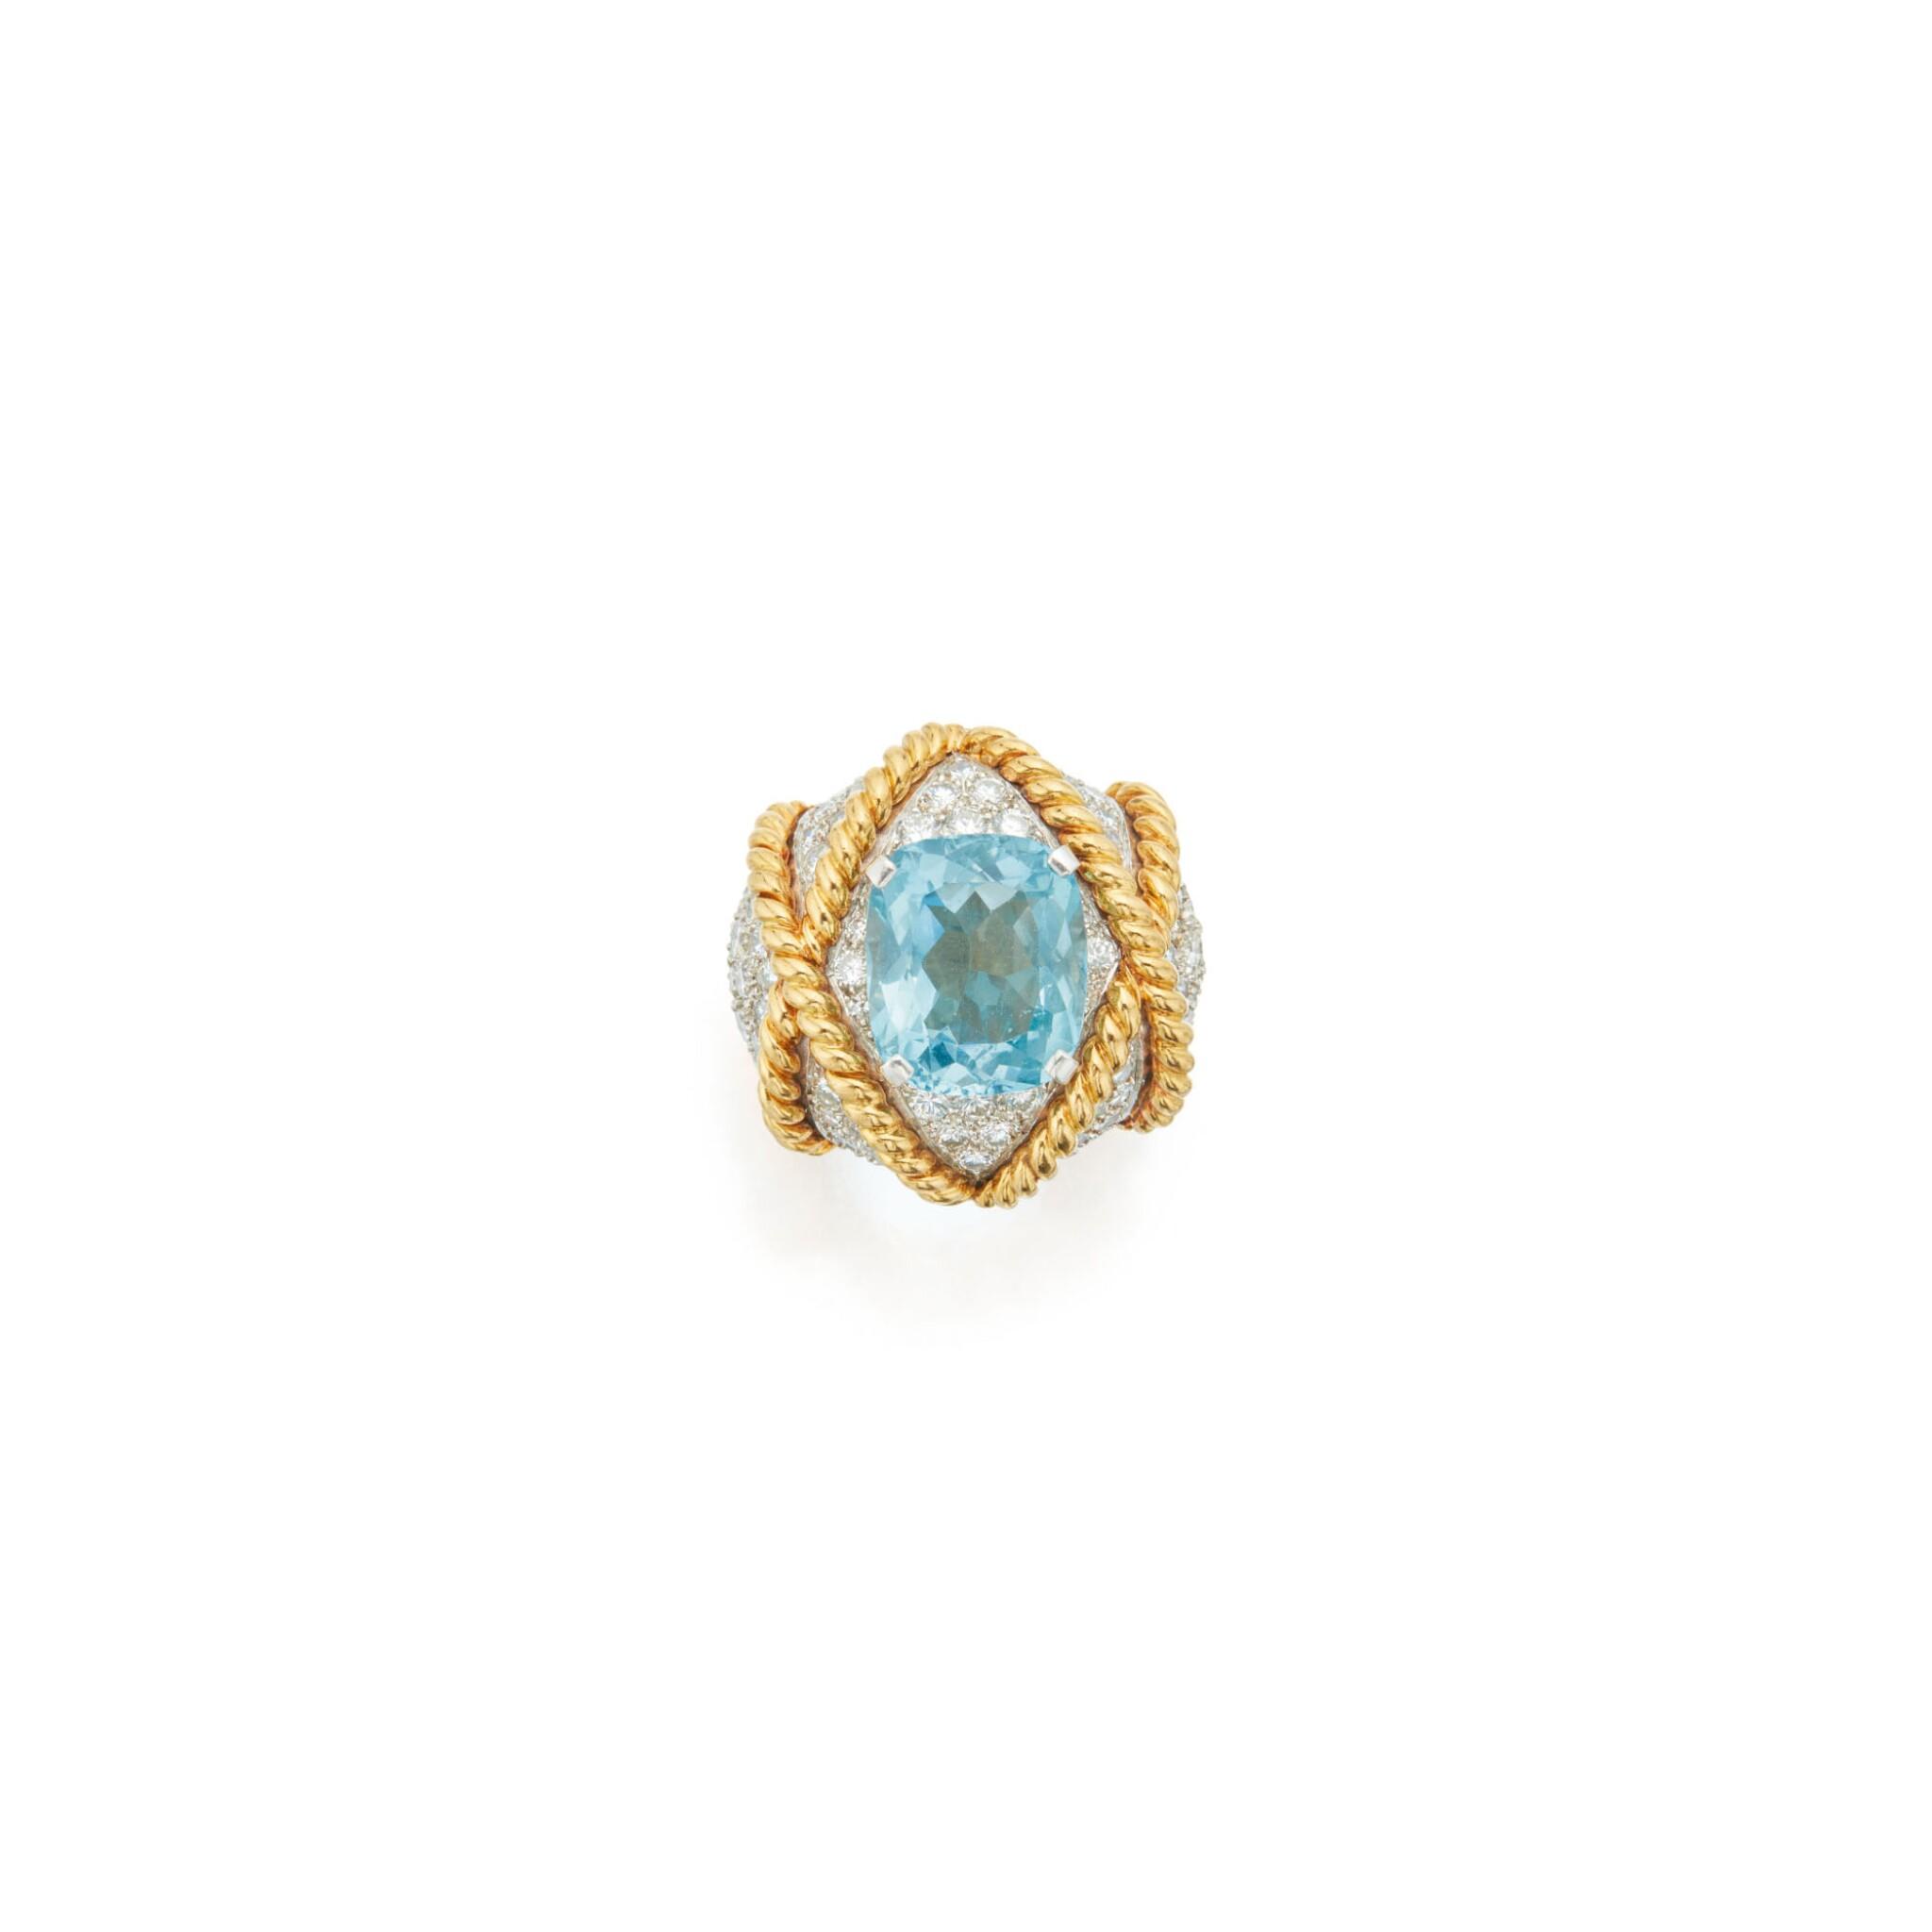 AQUAMARINE AND DIAMOND RING, VERDURA